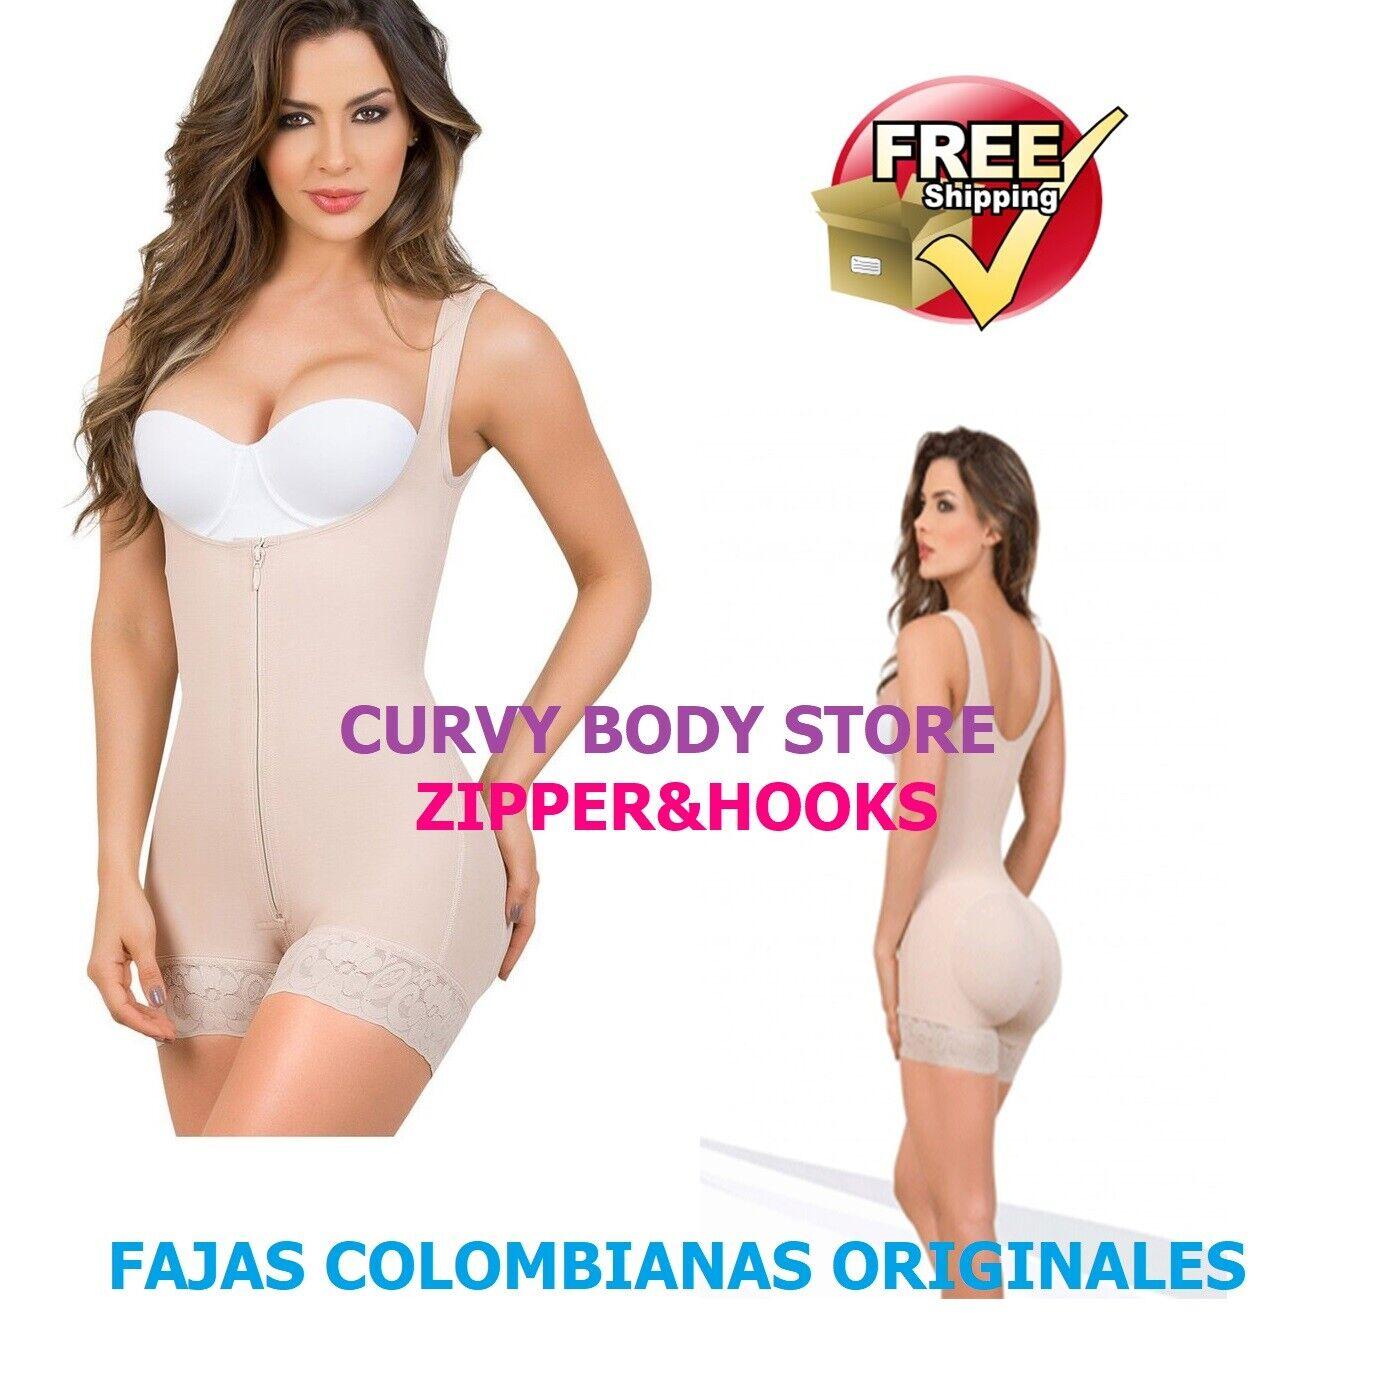 FAJAS 100% COLOMBIANAS LEVANTA COLA CON ZIPPER WOMEN'S POST SURGERY REDUCTION